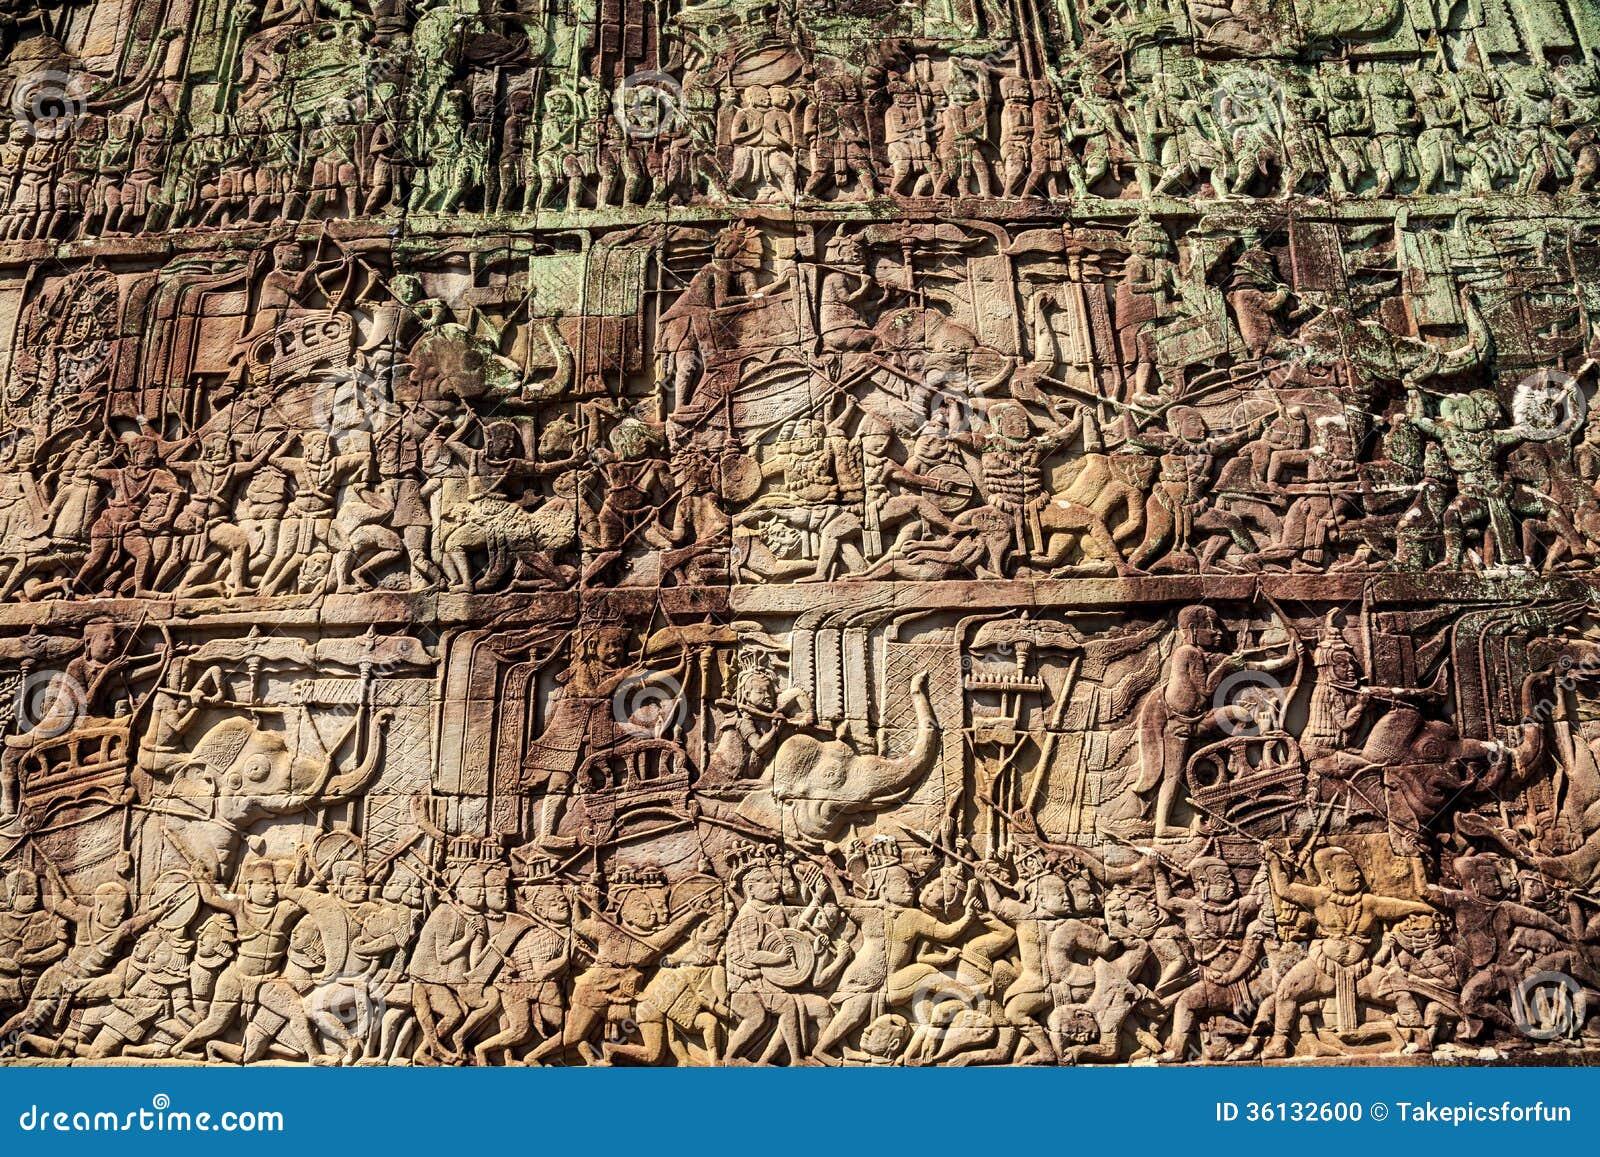 Ancient stone carving on the wall at angkor thom stock